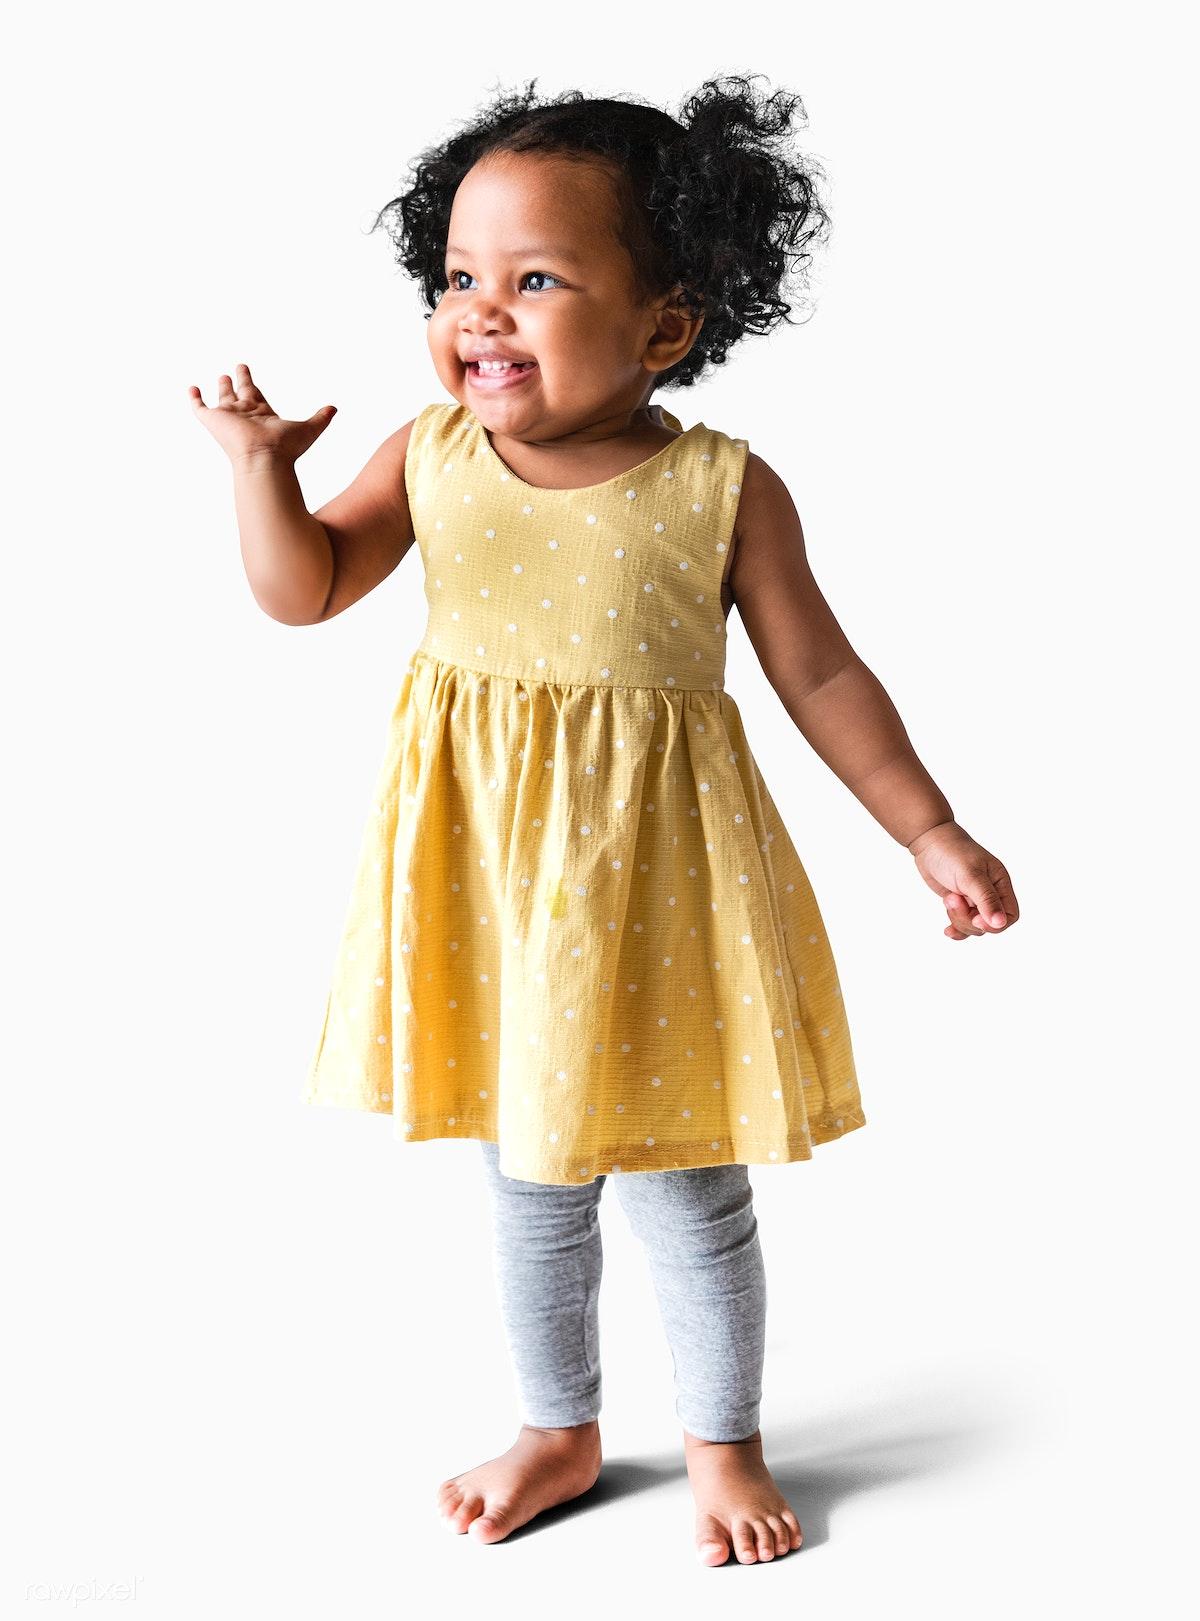 2a68e97eaa925 Happy little girl in a yellow dress